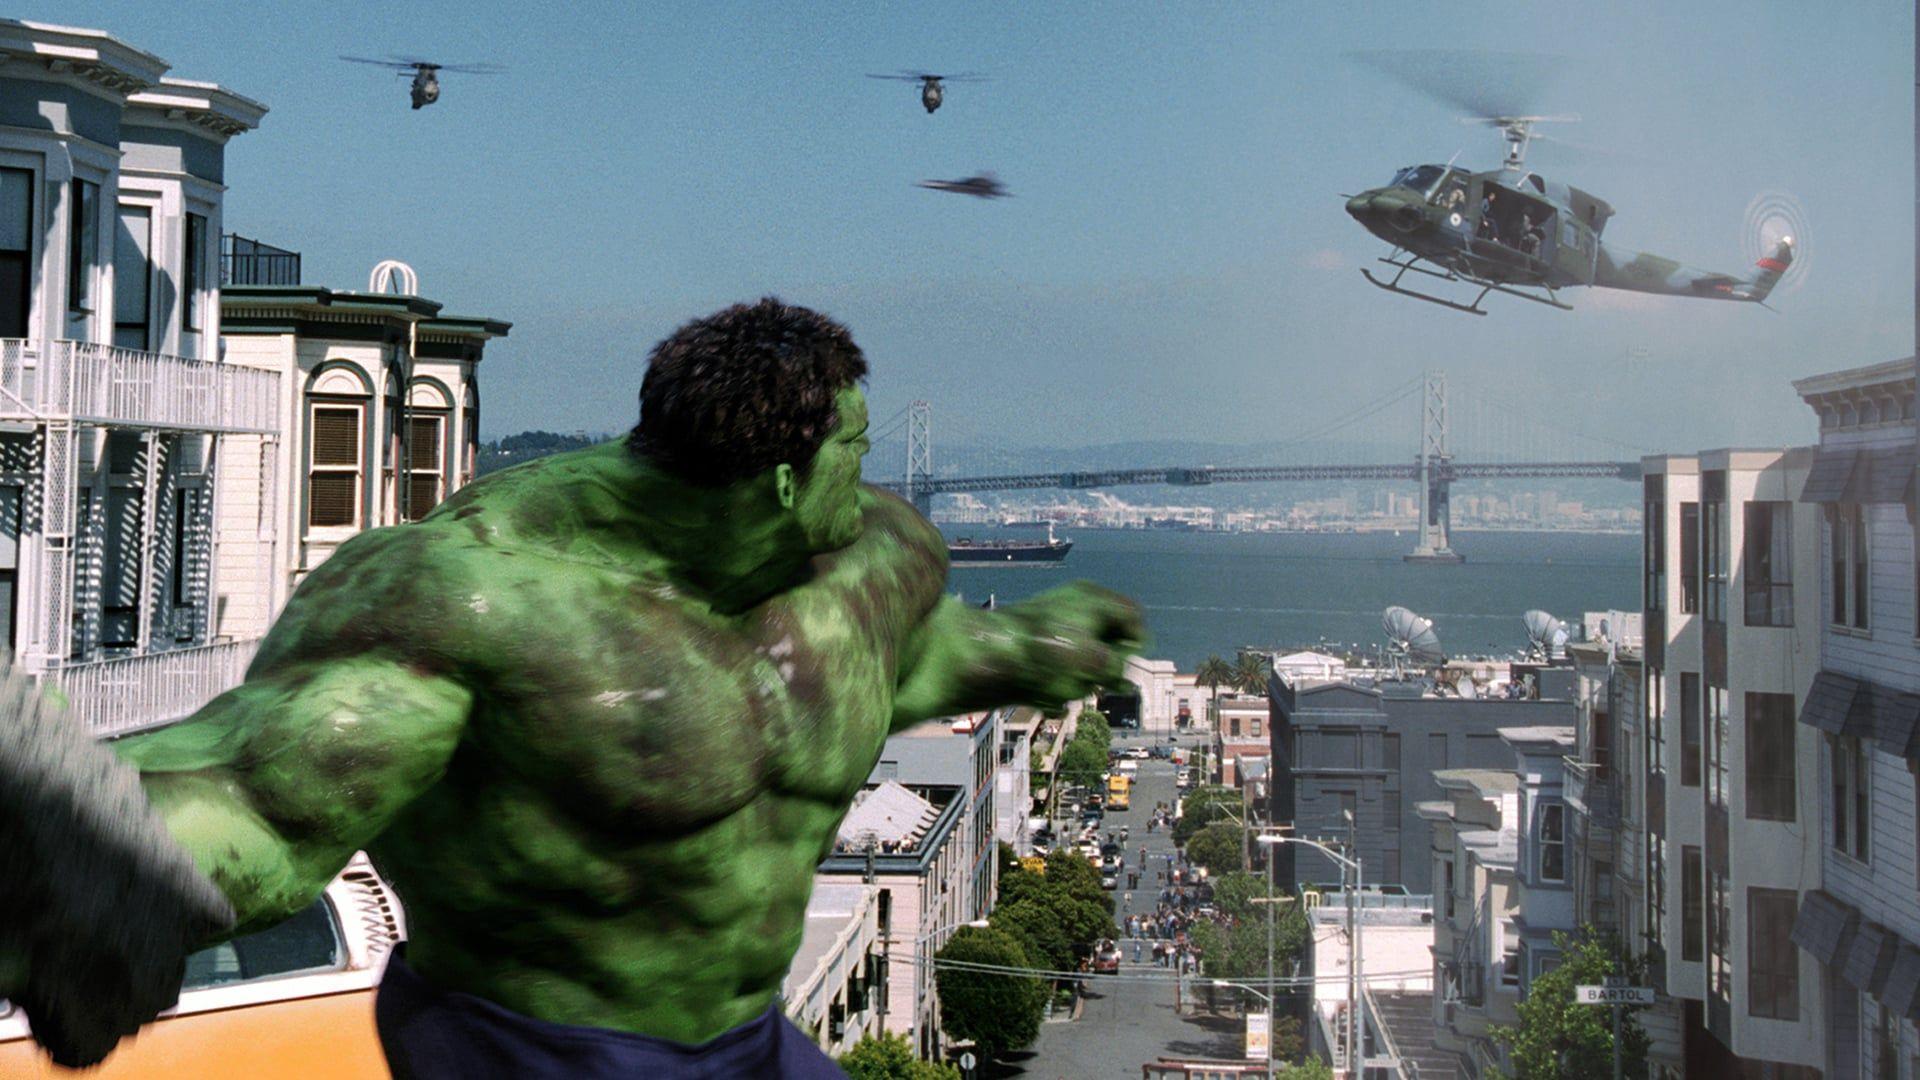 Watch Hulk 2003 Full Movie Online Streaming Movie123 Bruce Banner A Genetics Researcher With A Tragic Past Suffers Massive Ra Hulk Movie 2003 Hulk Hulk Movie